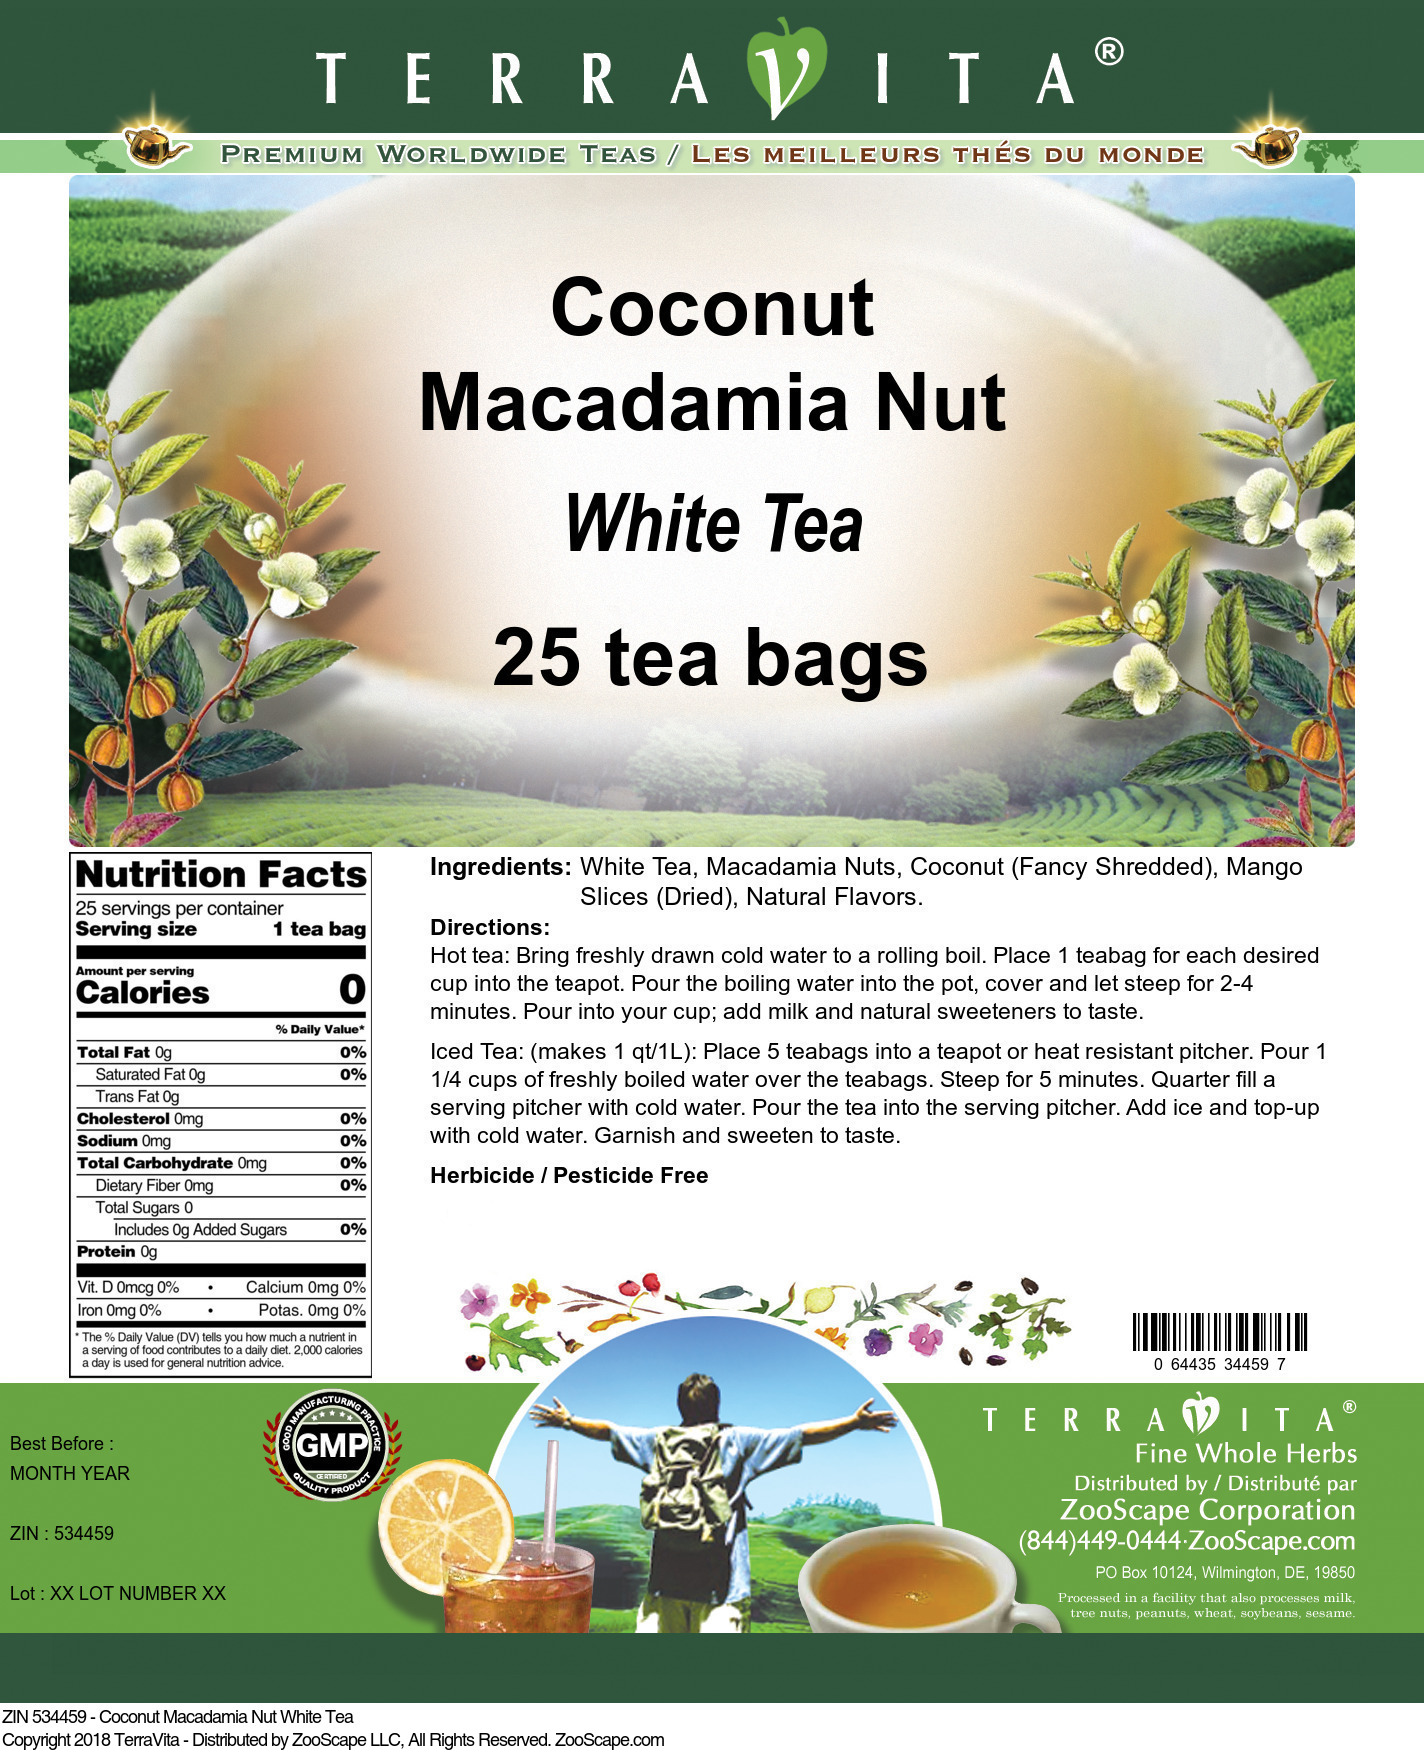 Coconut Macadamia Nut White Tea